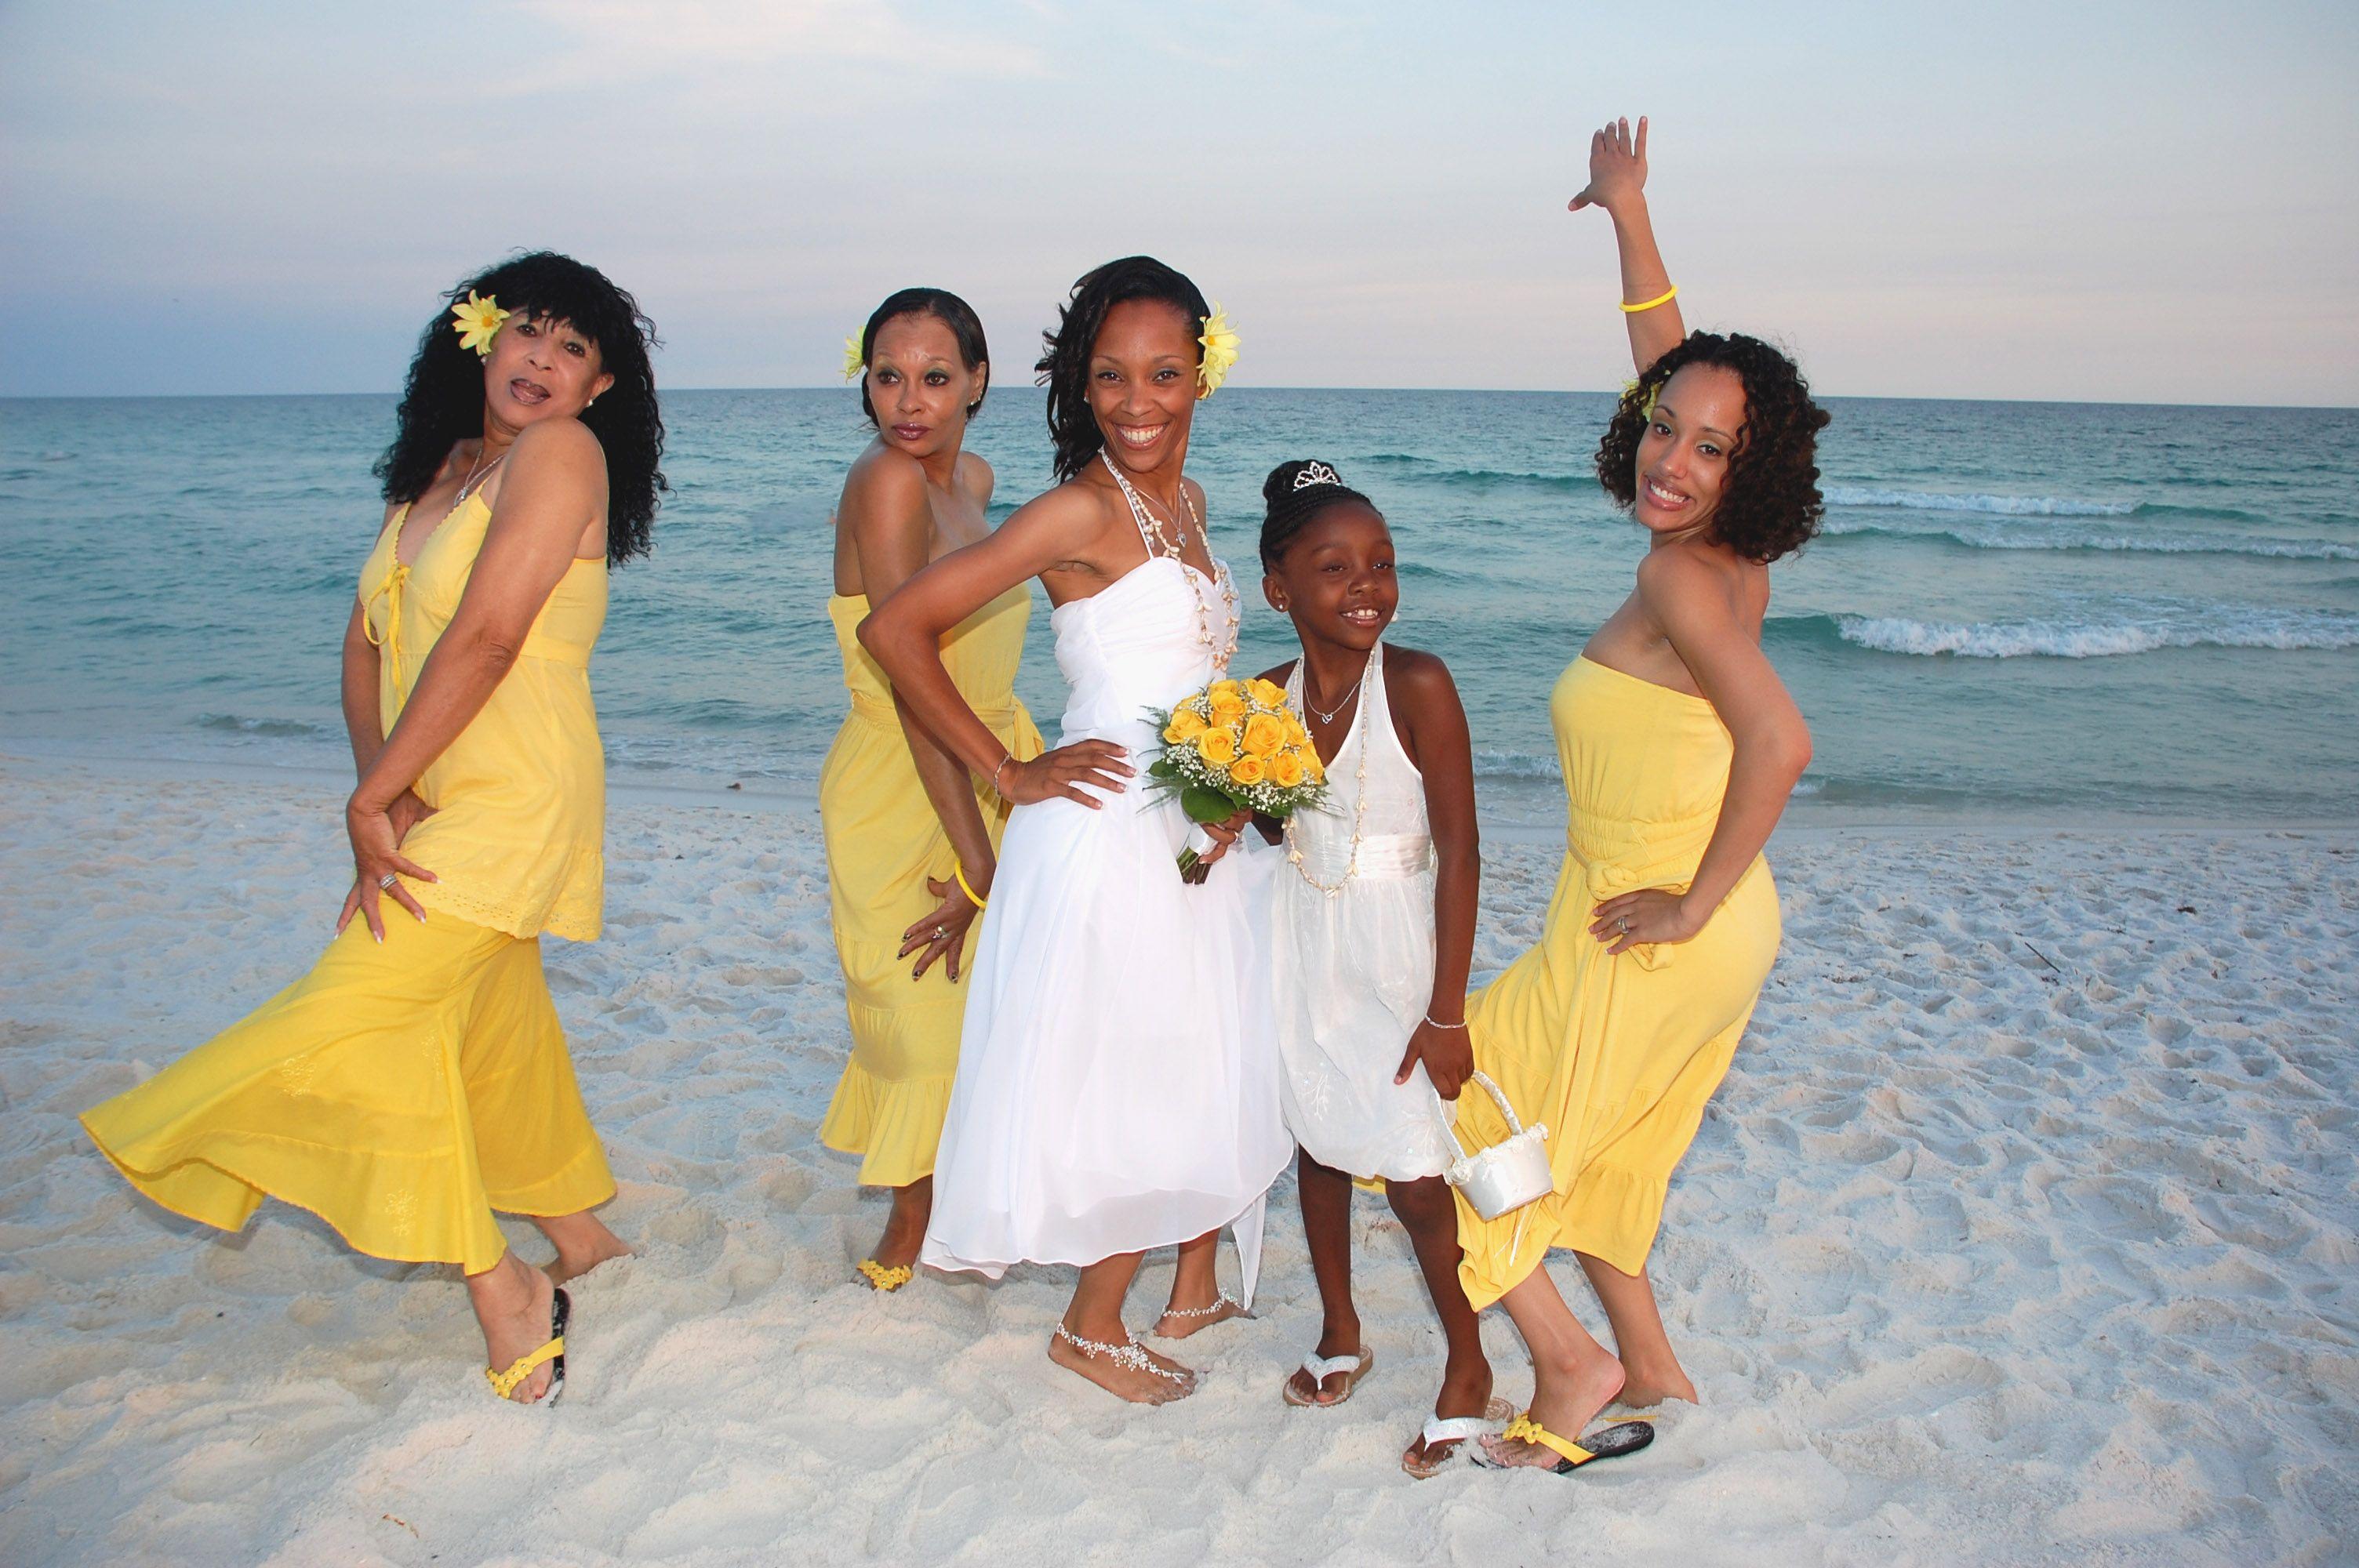 Florida Beach Weddings By Barefoot Weddings Florida Beach Wedding Beach Wedding Yellow Barefoot Wedding